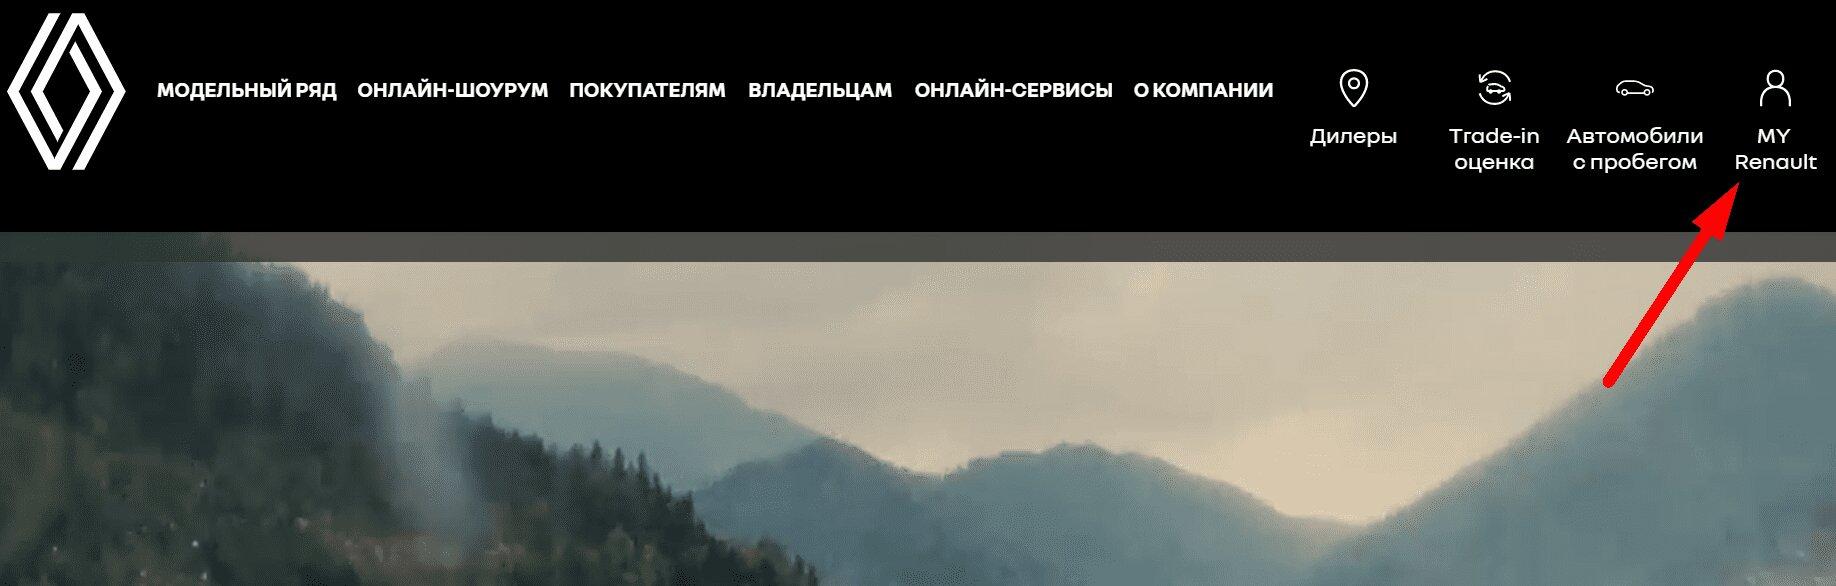 Официальный сайт автоконцерна «MY Renault»